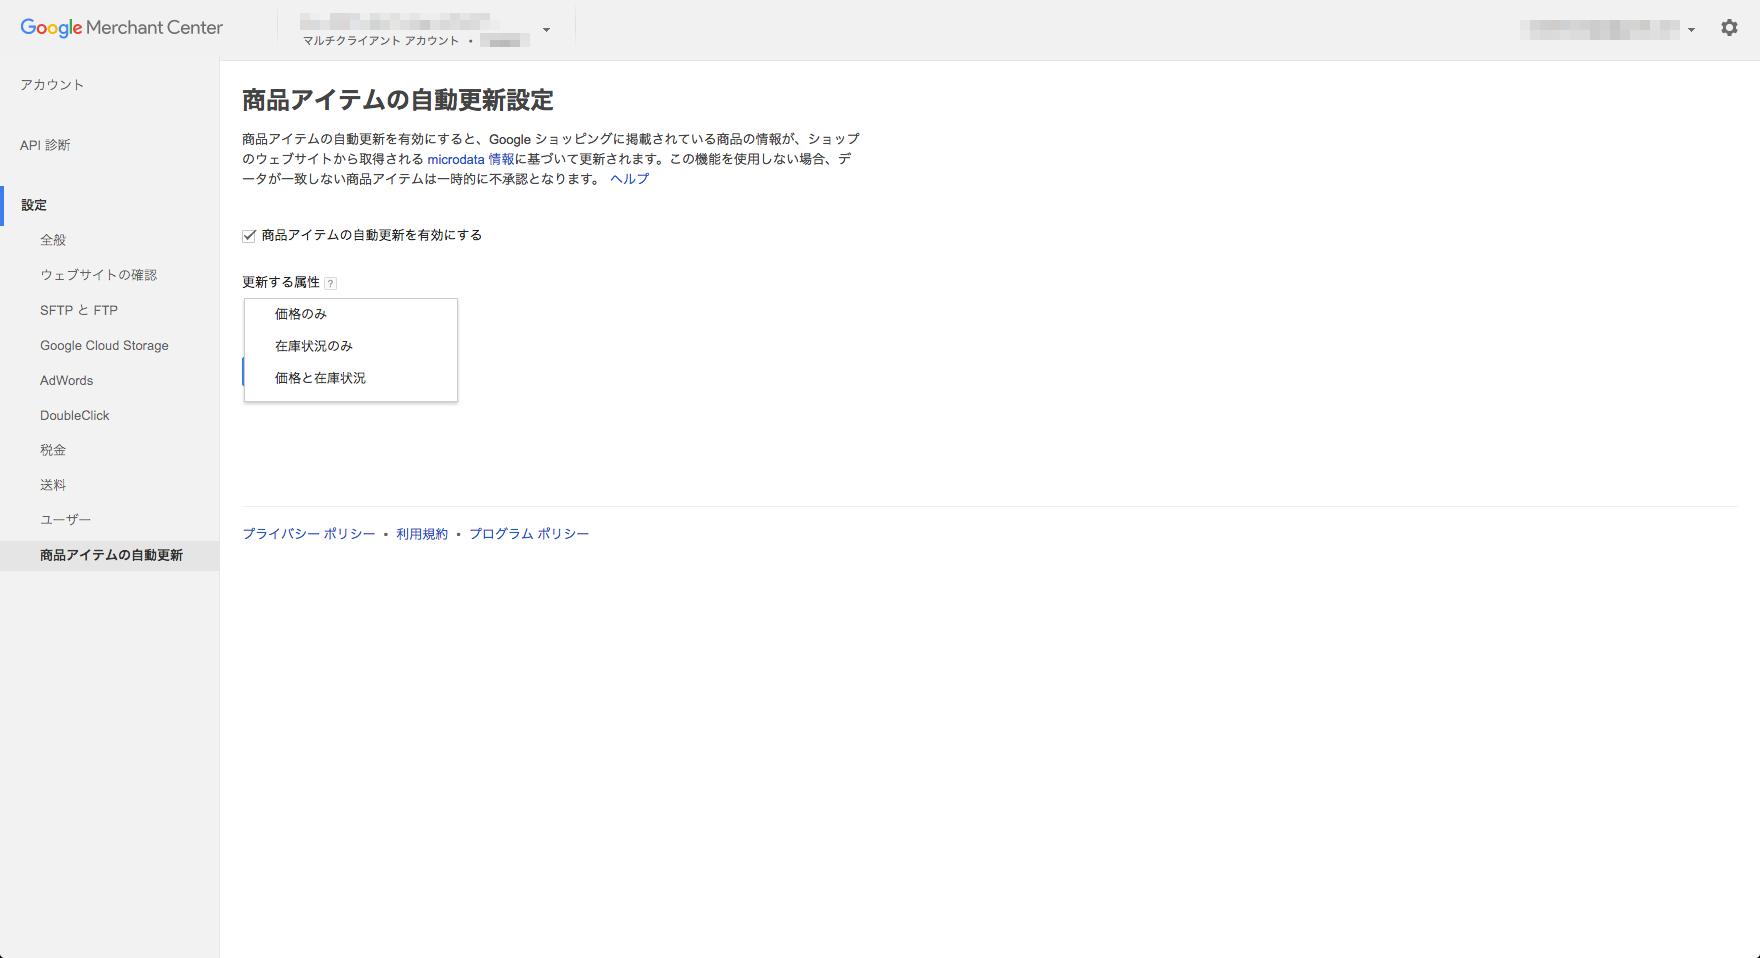 Googleマーチャントセンターでの商品アイテムの自動更新の設定方法